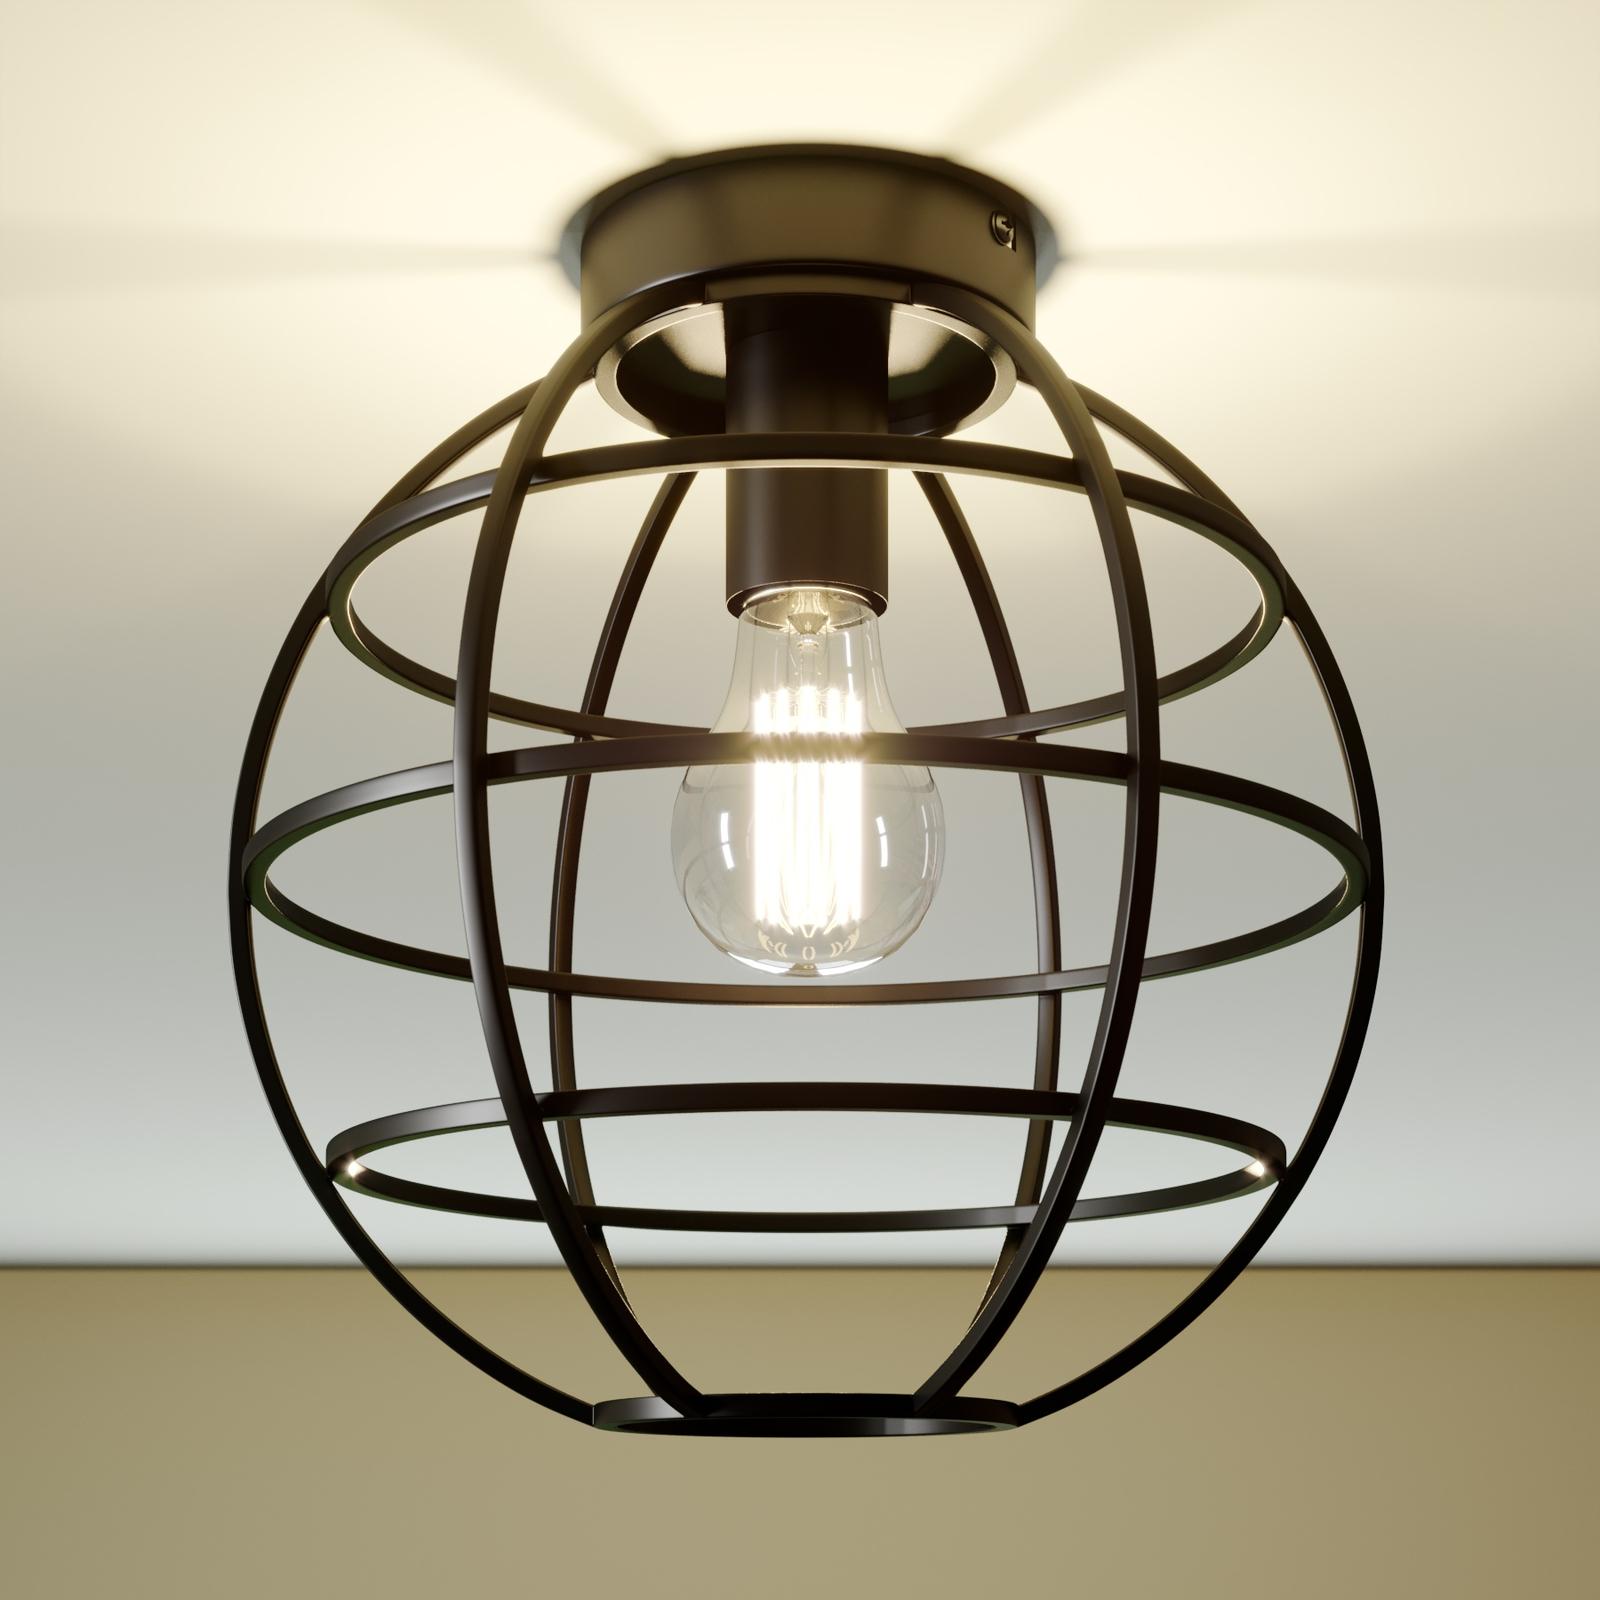 Lampa sufitowa klatka Bekira, czarna